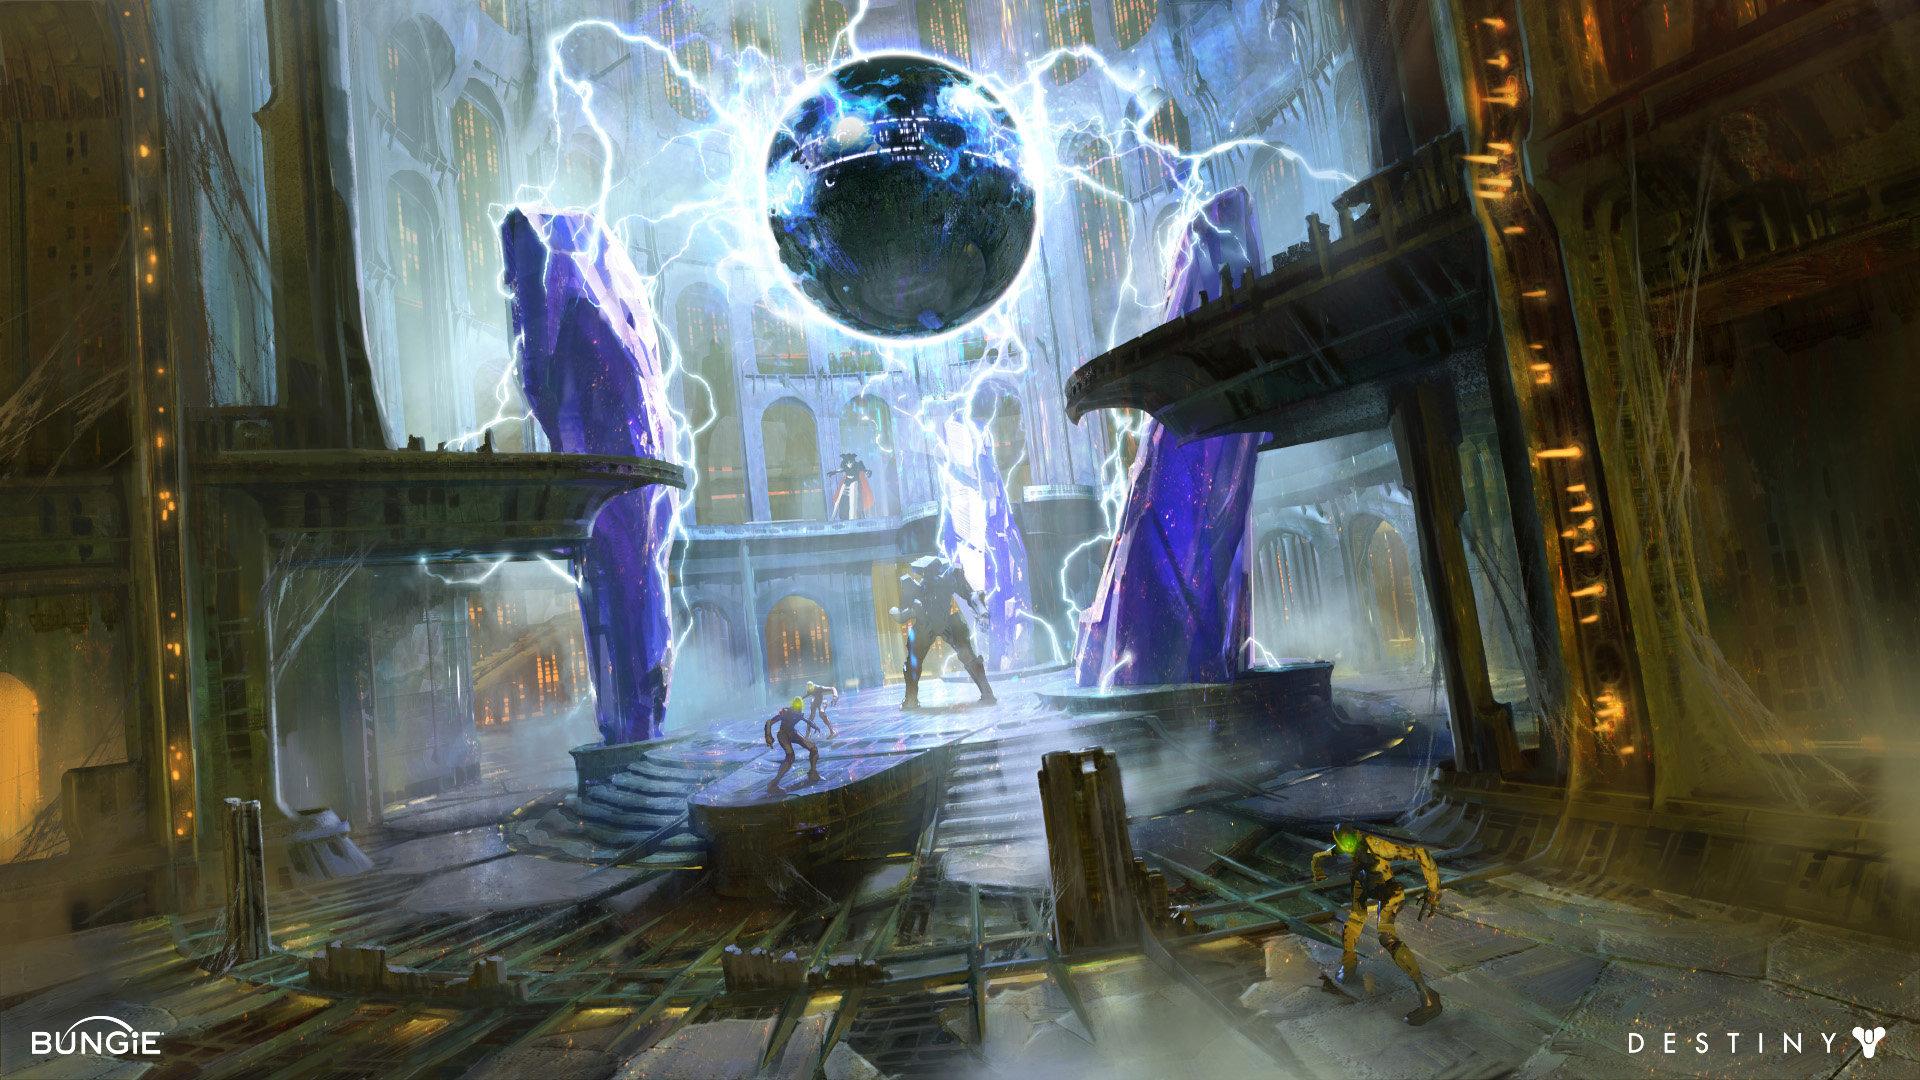 Destiny 2 Kings Fall Wallpaper Artstation Destiny Hive Dreadnaught Interiors Dorje